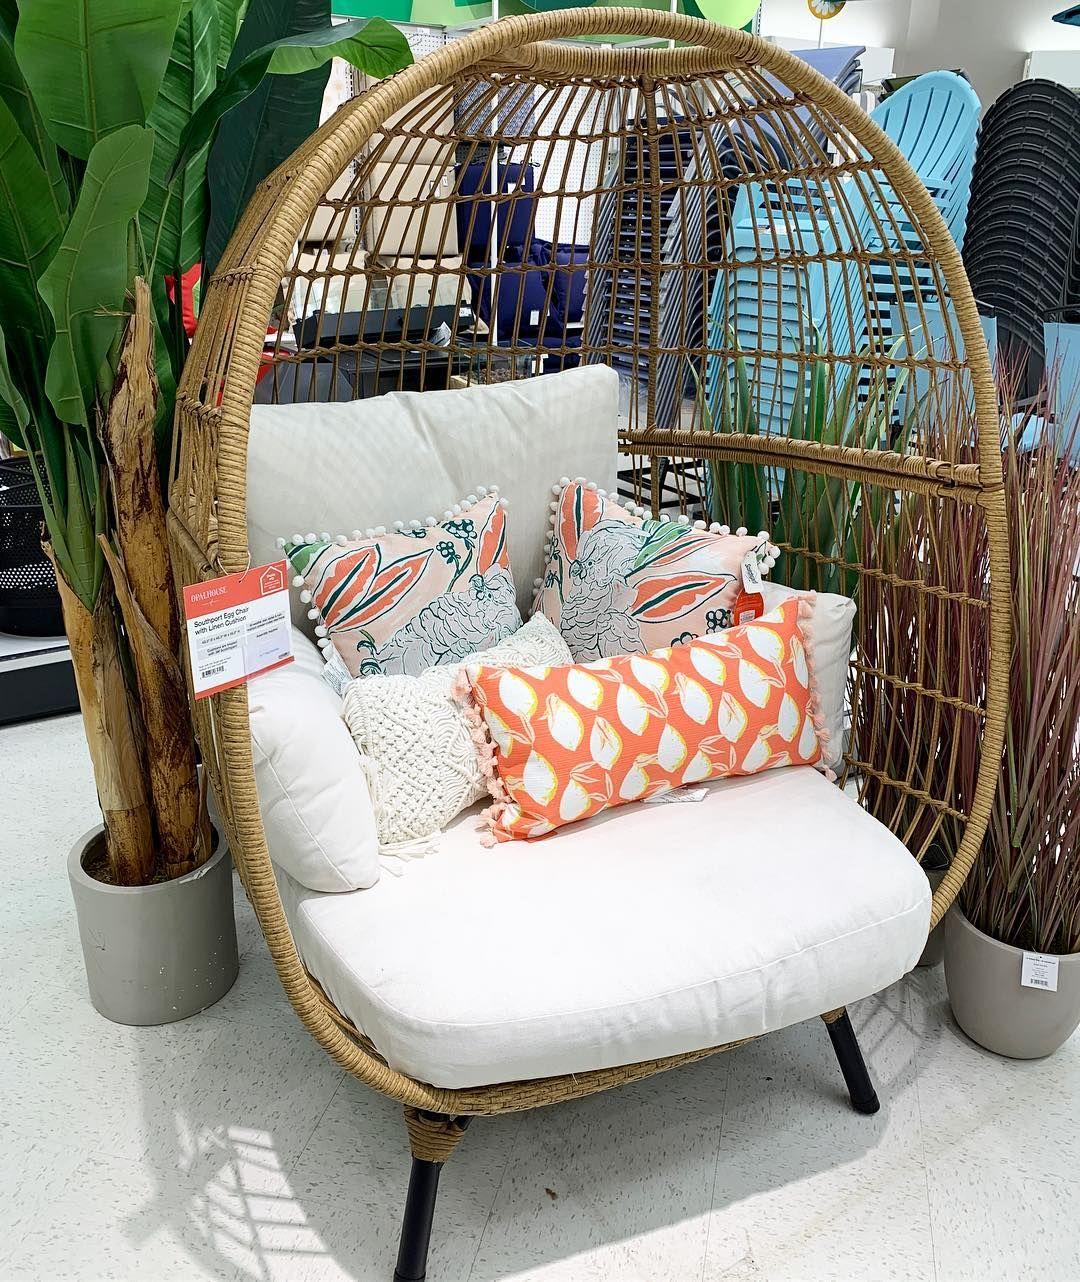 Targetdoesitagain On Instagram This Patio Chair Link In Bio